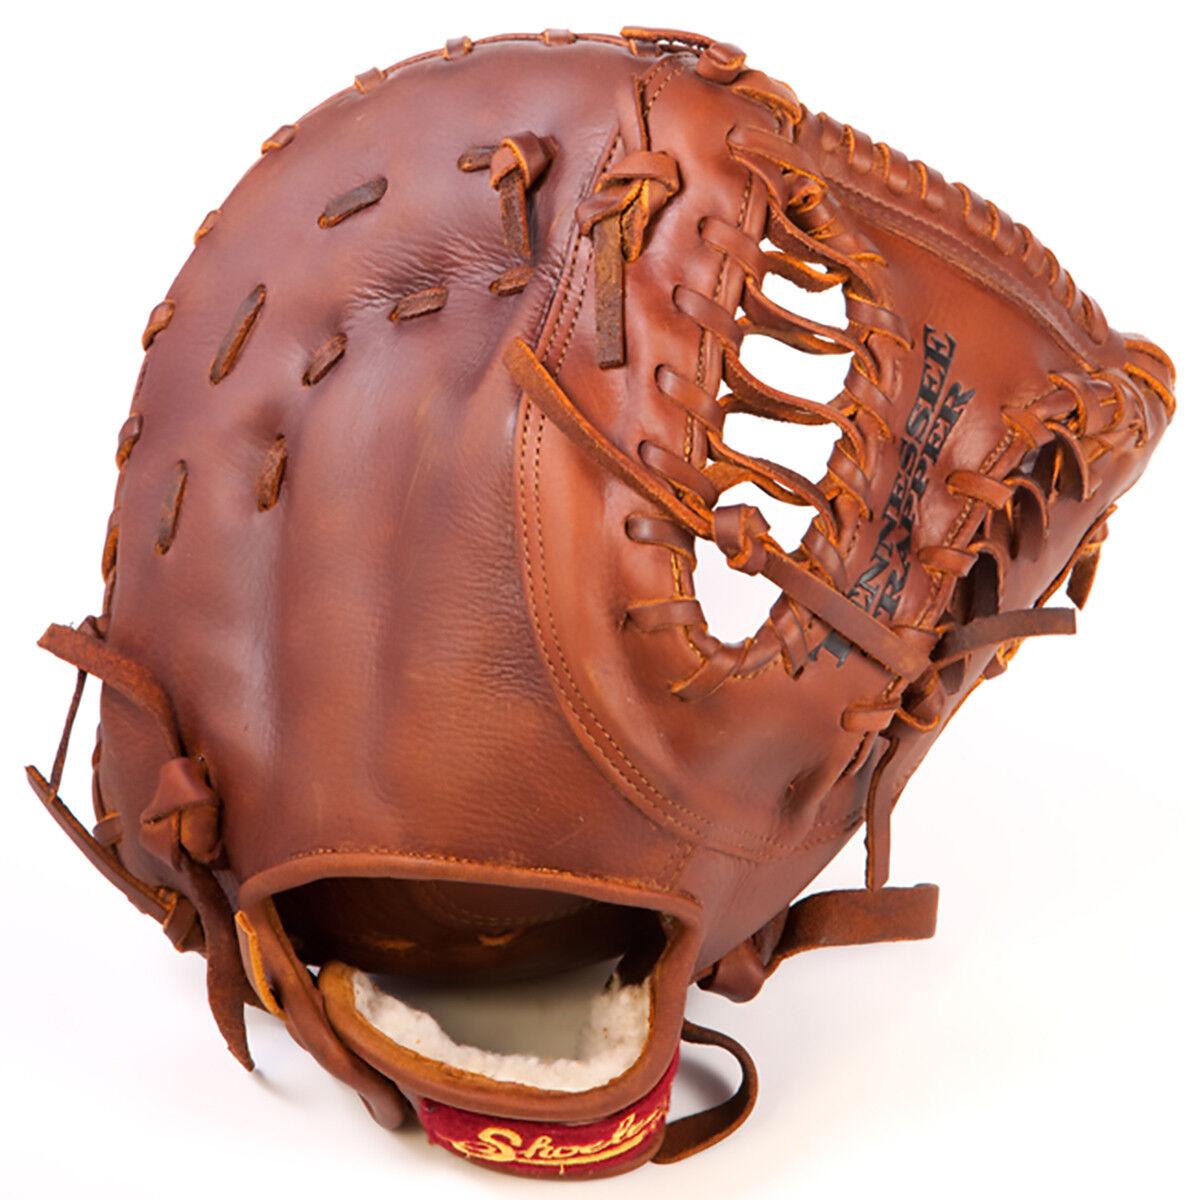 zapatosless Joe 1st base Trampero 13  Guante de béisbol (nuevo)